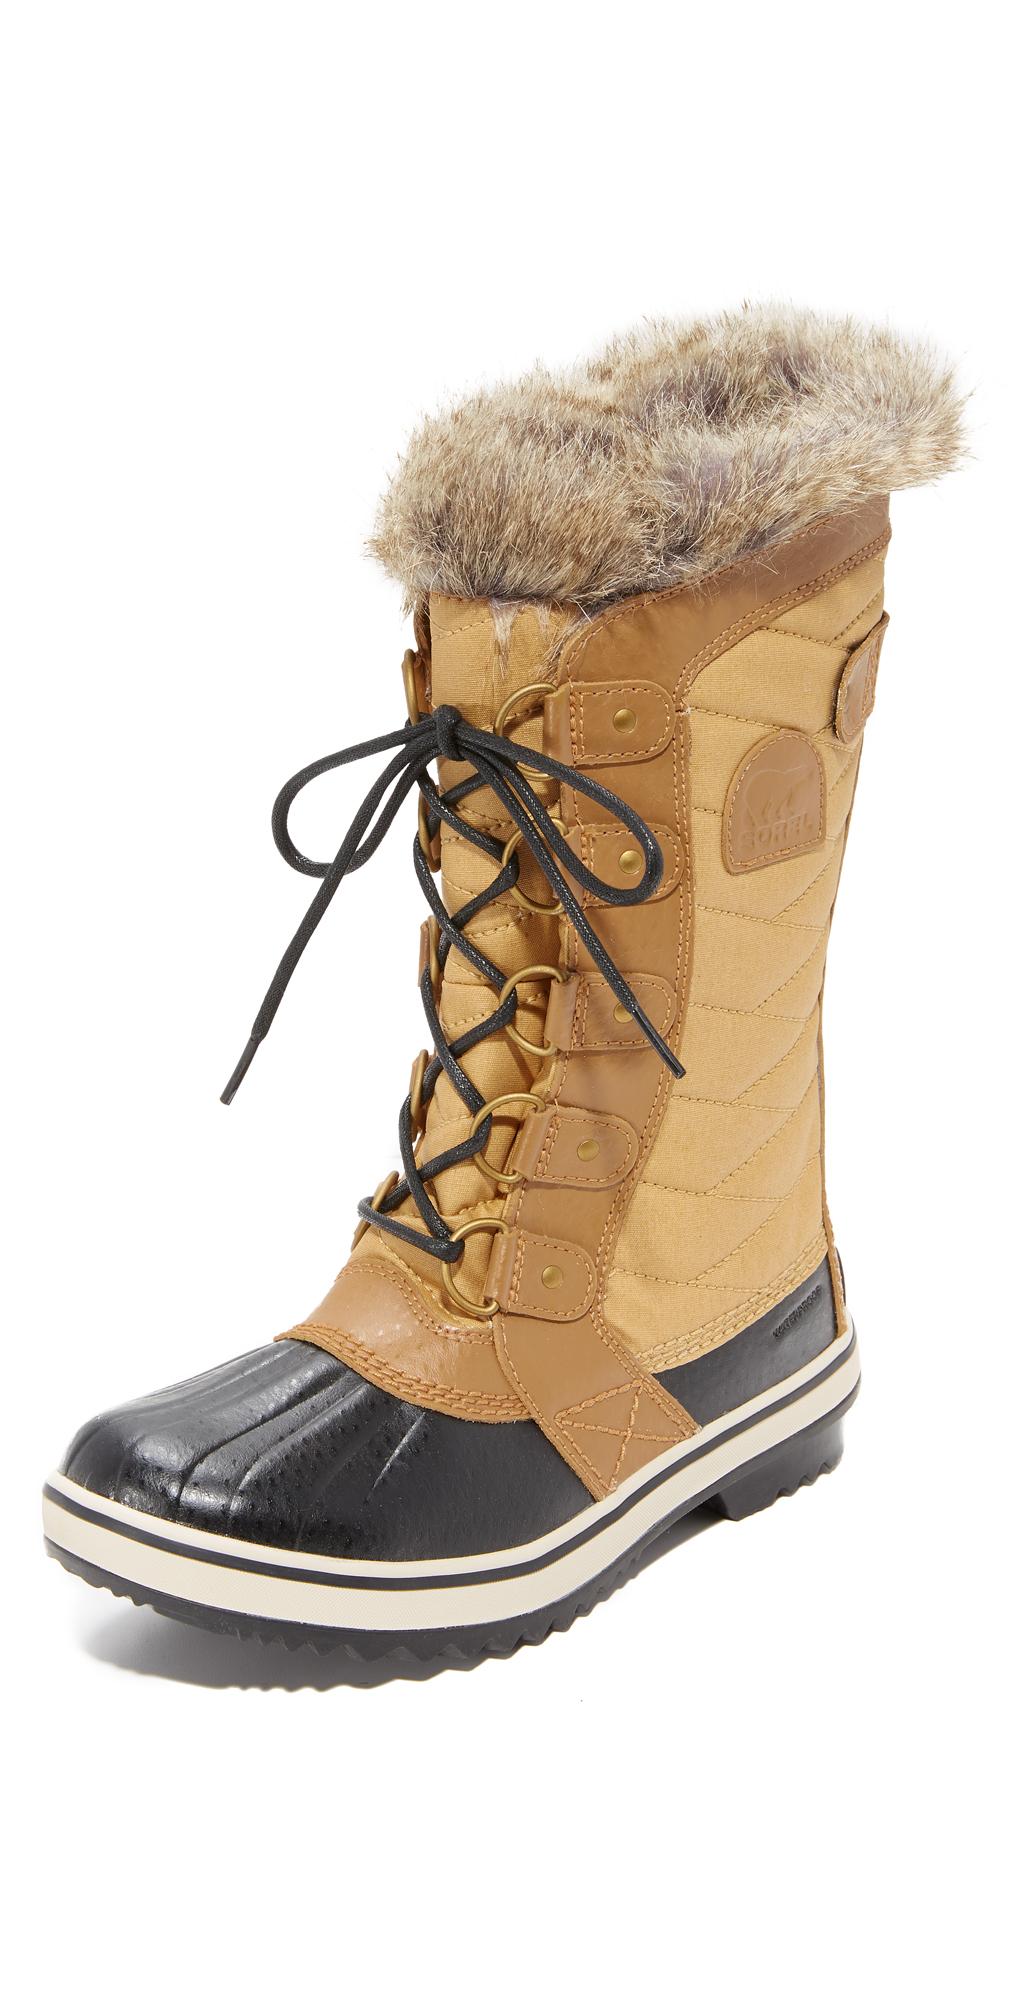 Tofino II Boots Sorel